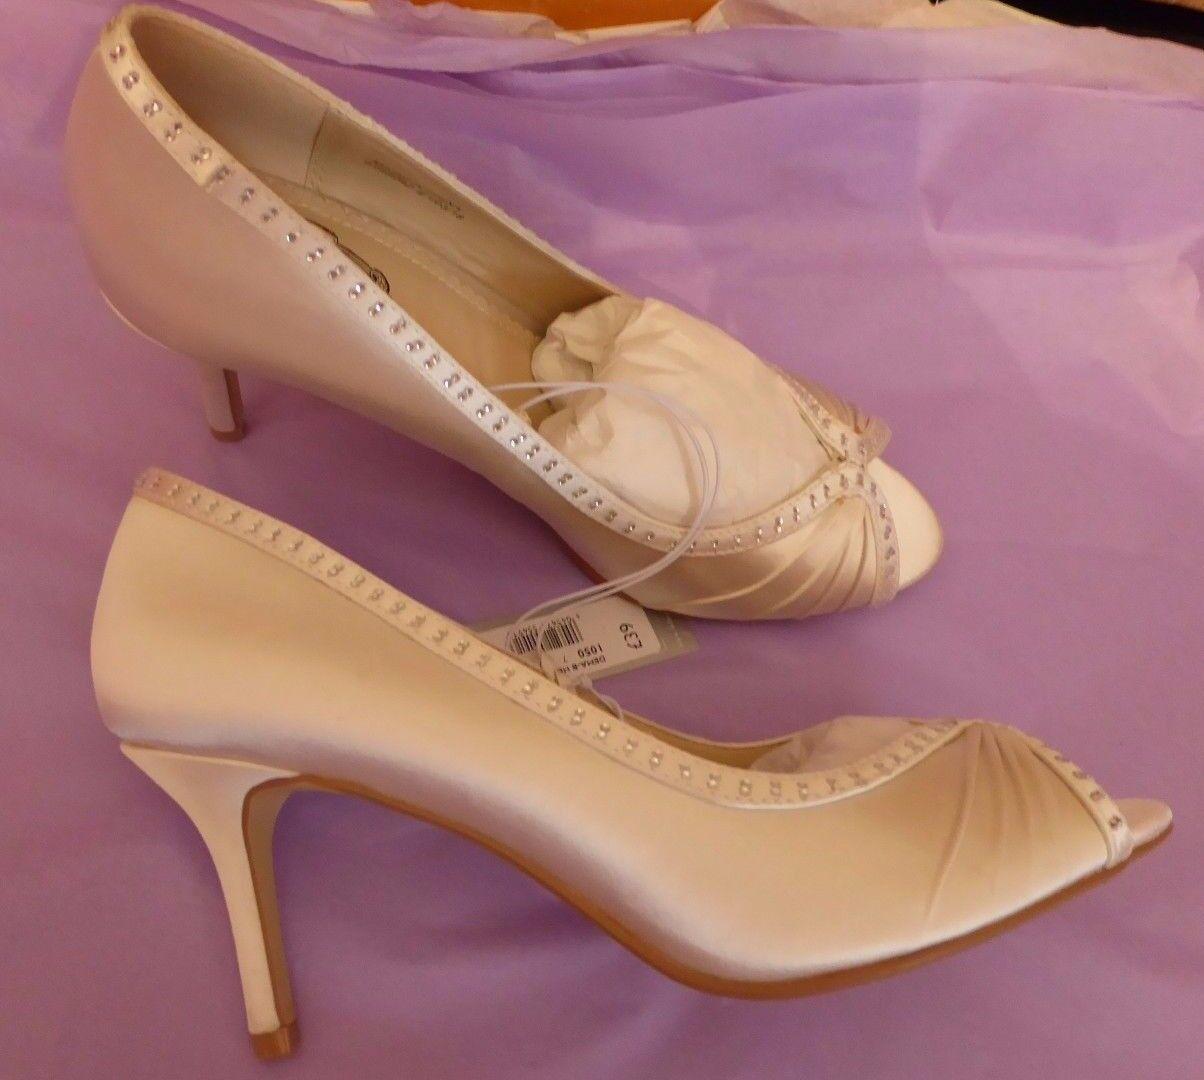 Debenham Debut UK6 EU39 US8 new ivory satin peep top diamante trim bridal shoes